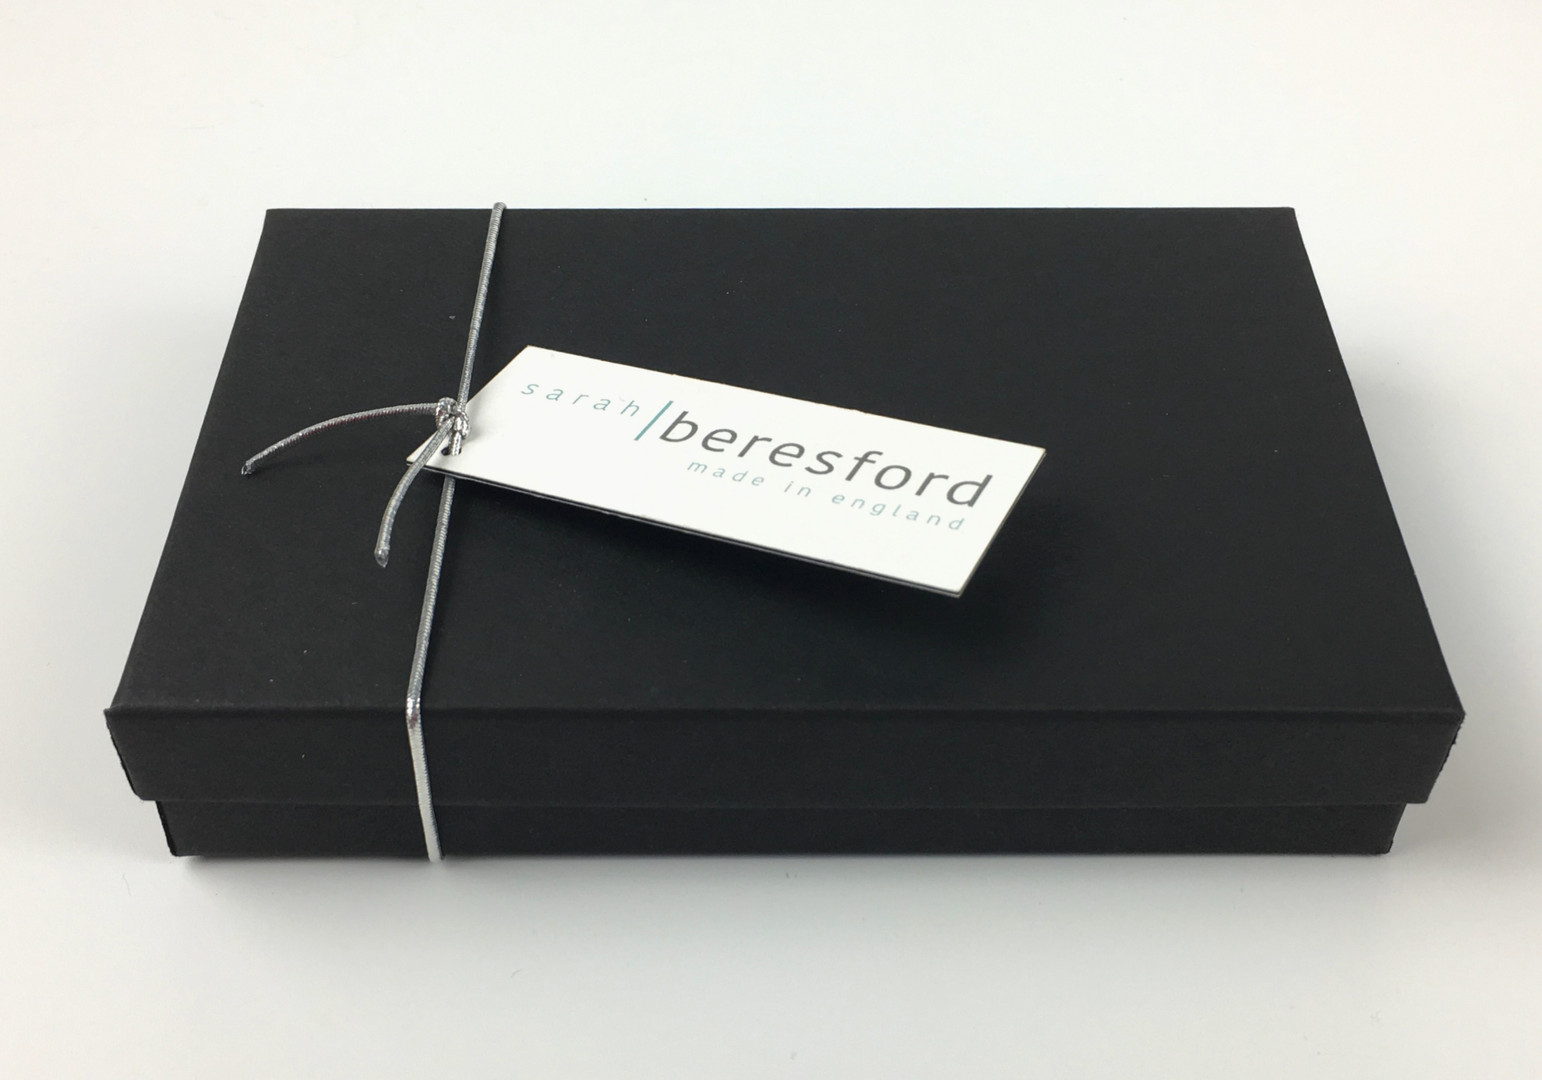 Bow tie gift box